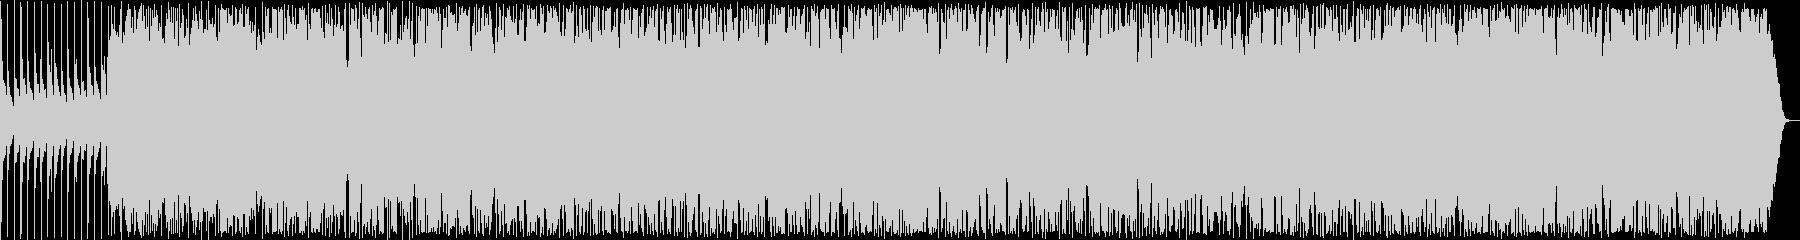 Kazeya Fuze / Okinawan folk song's unreproduced waveform